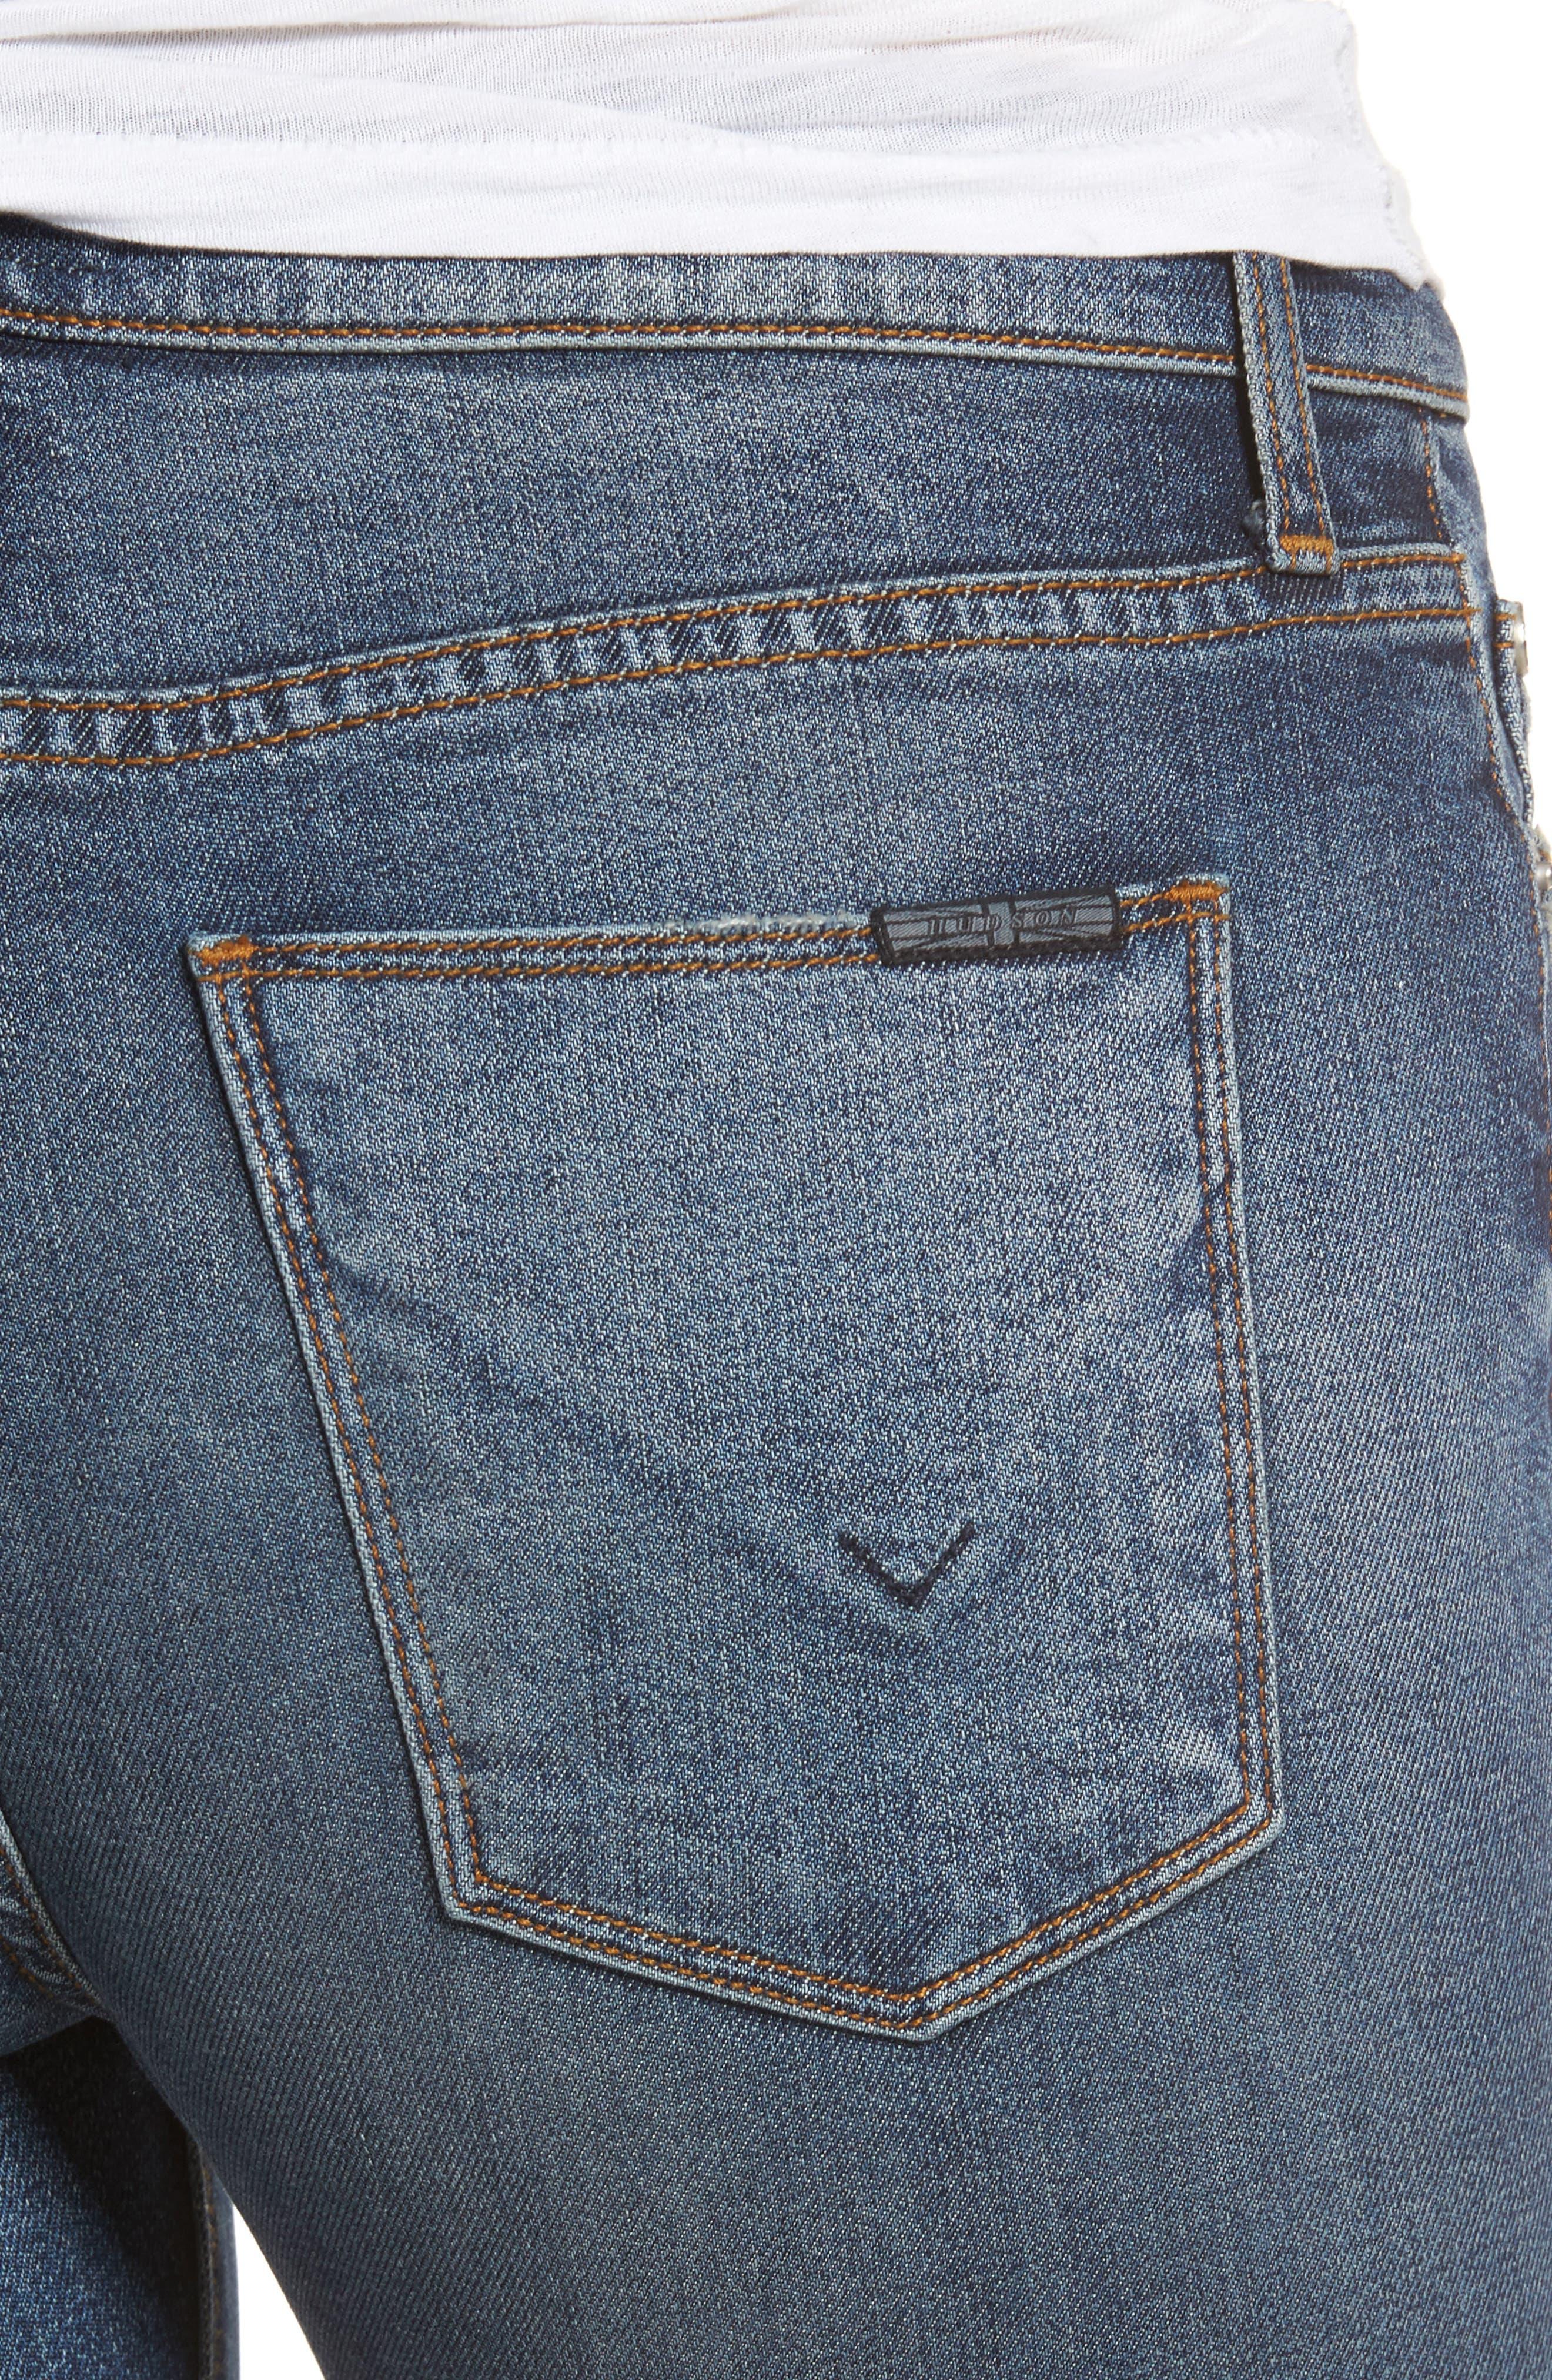 Barbara High Waist Skinny Jeans,                             Alternate thumbnail 4, color,                             429